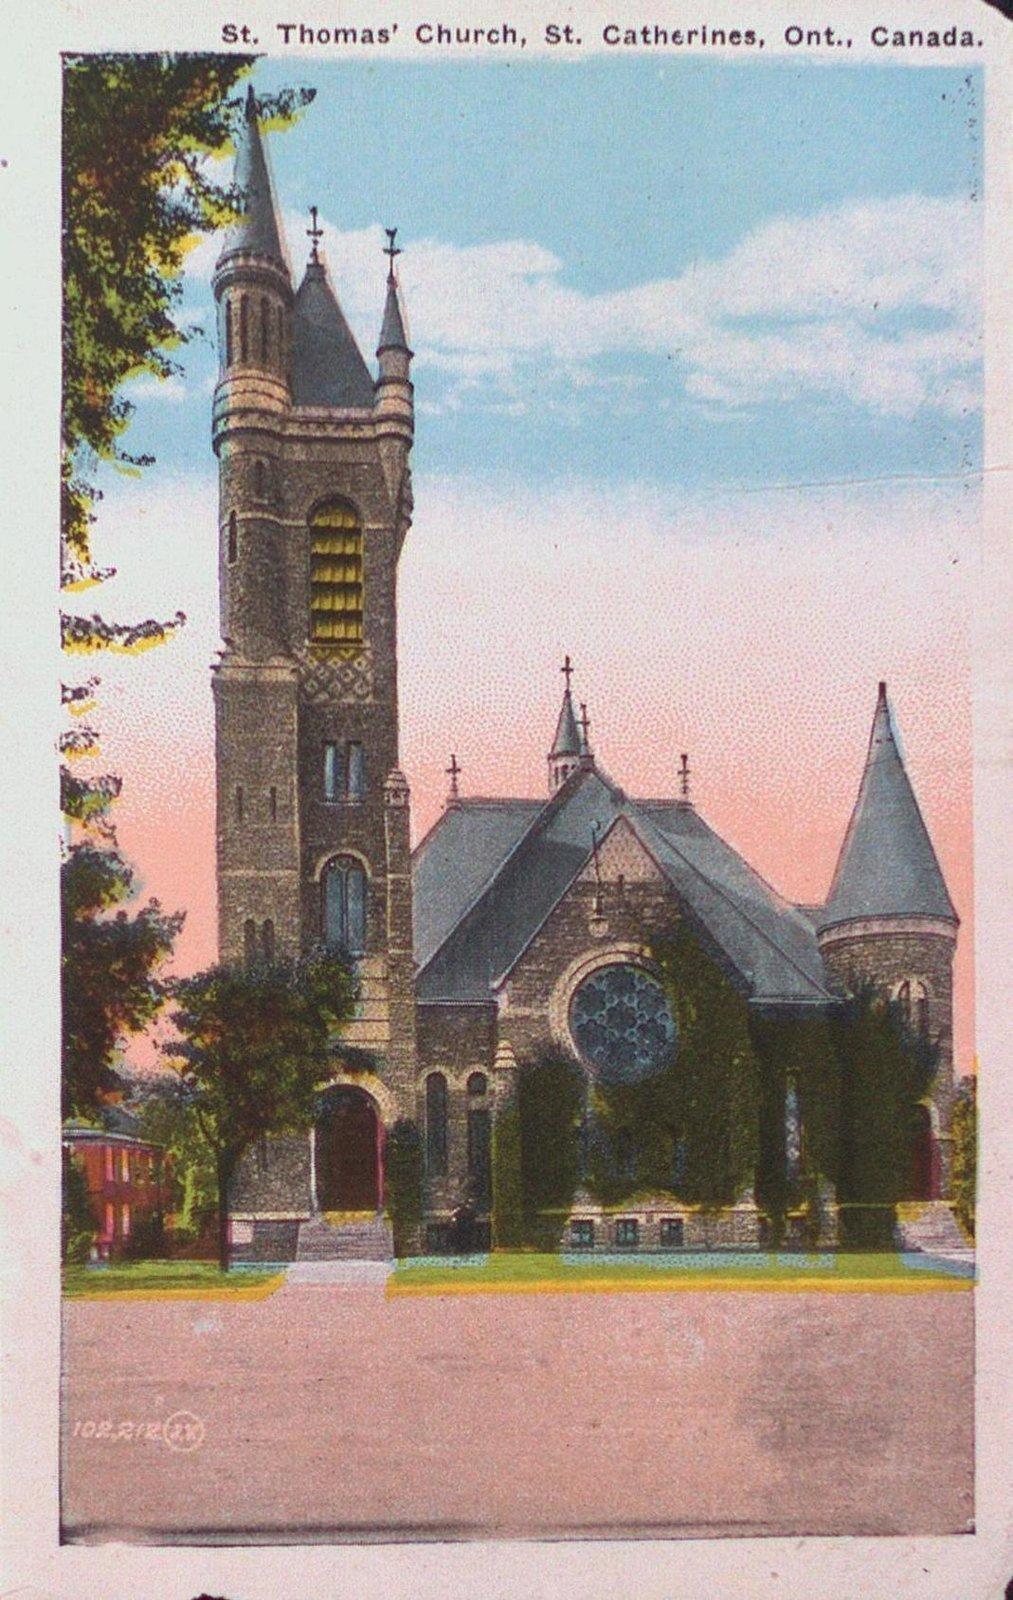 Views of St. Catharines: St. Thomas Church